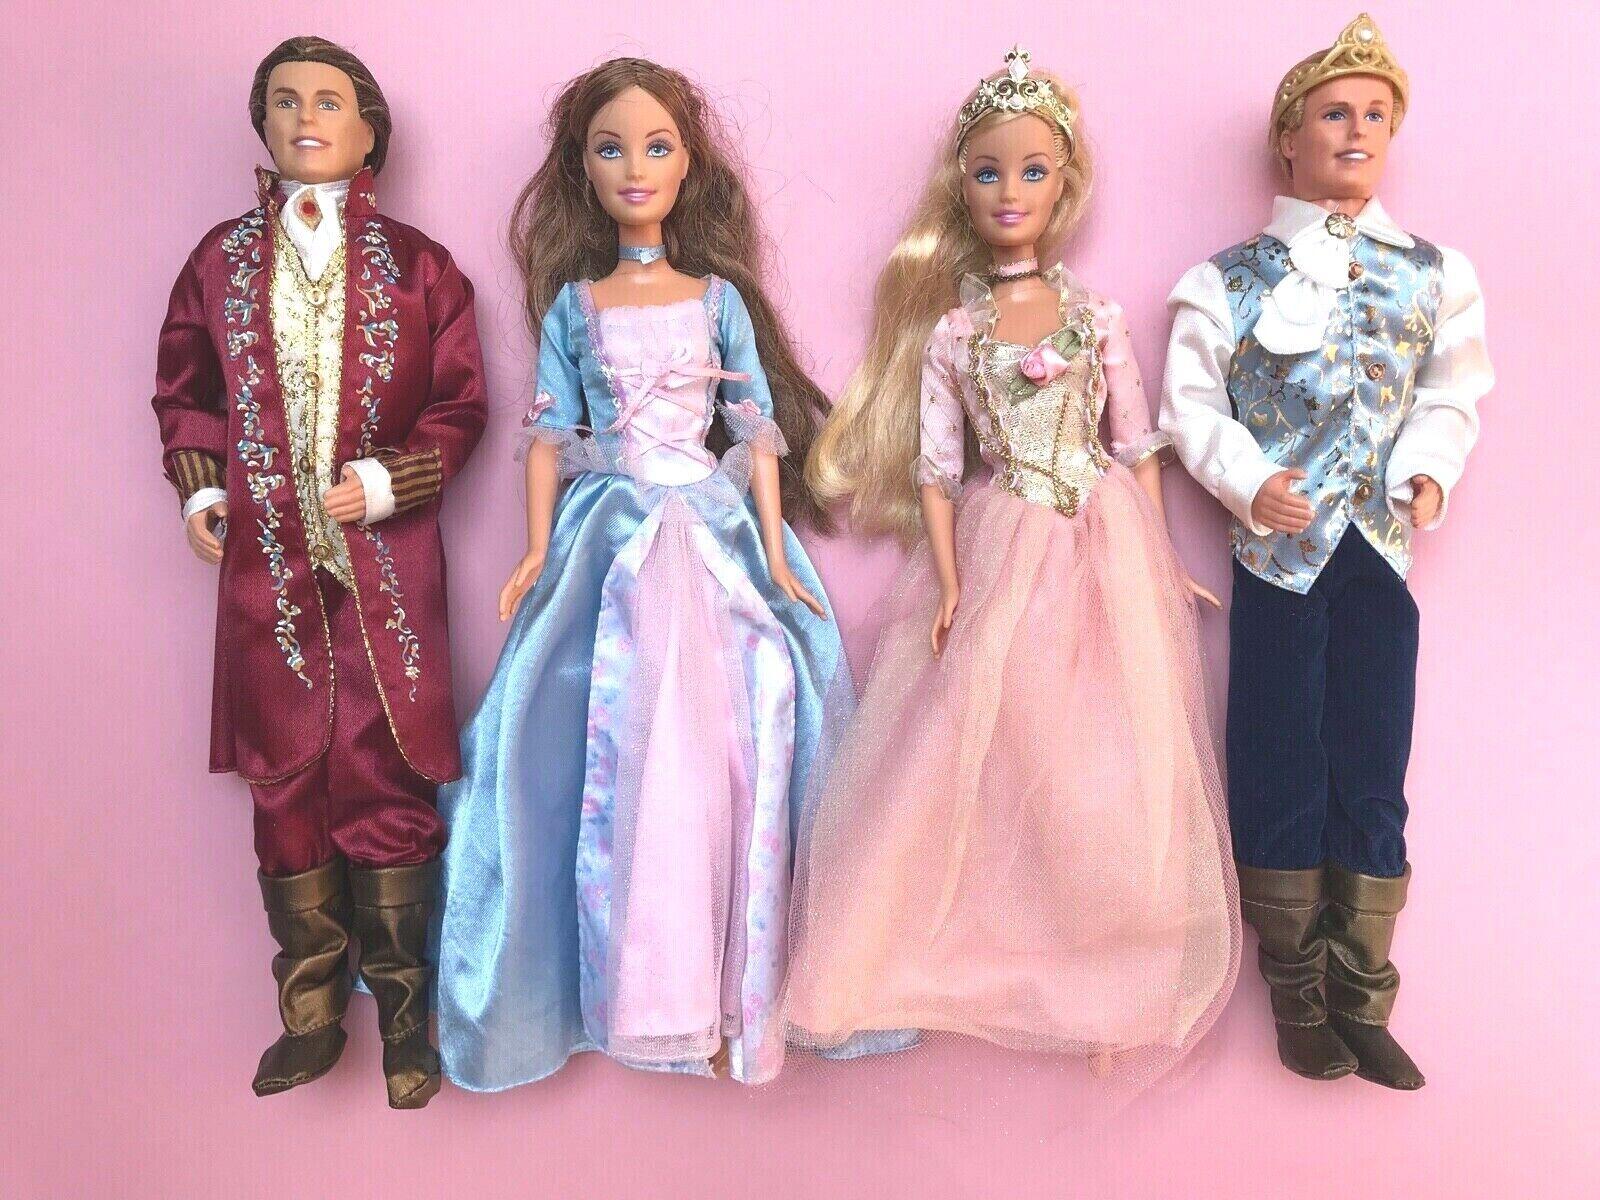 Muñeca Barbie Erika Kritsaralam rey Dominick Julian princesa y el Pauper Lote 4